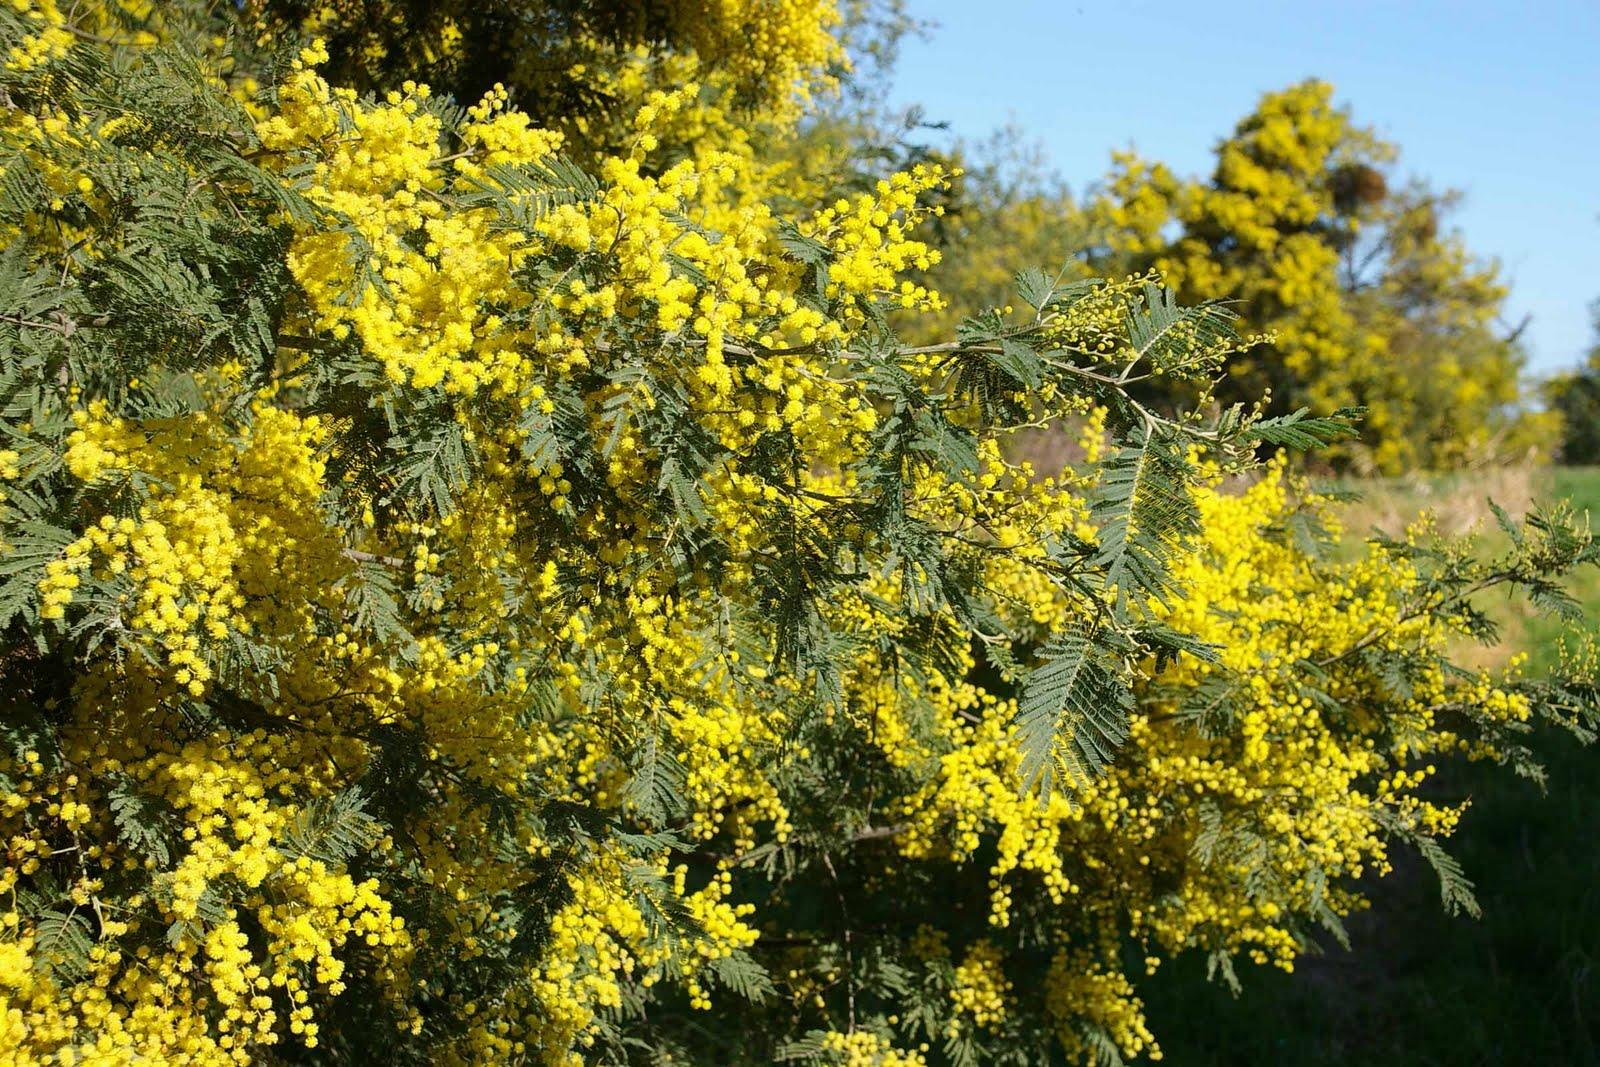 yellow wattle